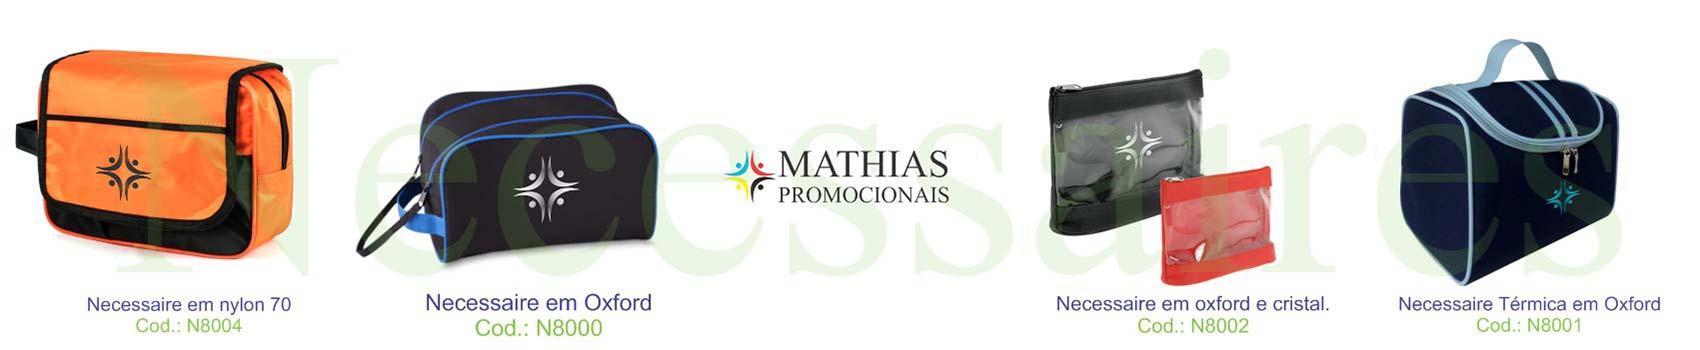 Mathias Promocionais